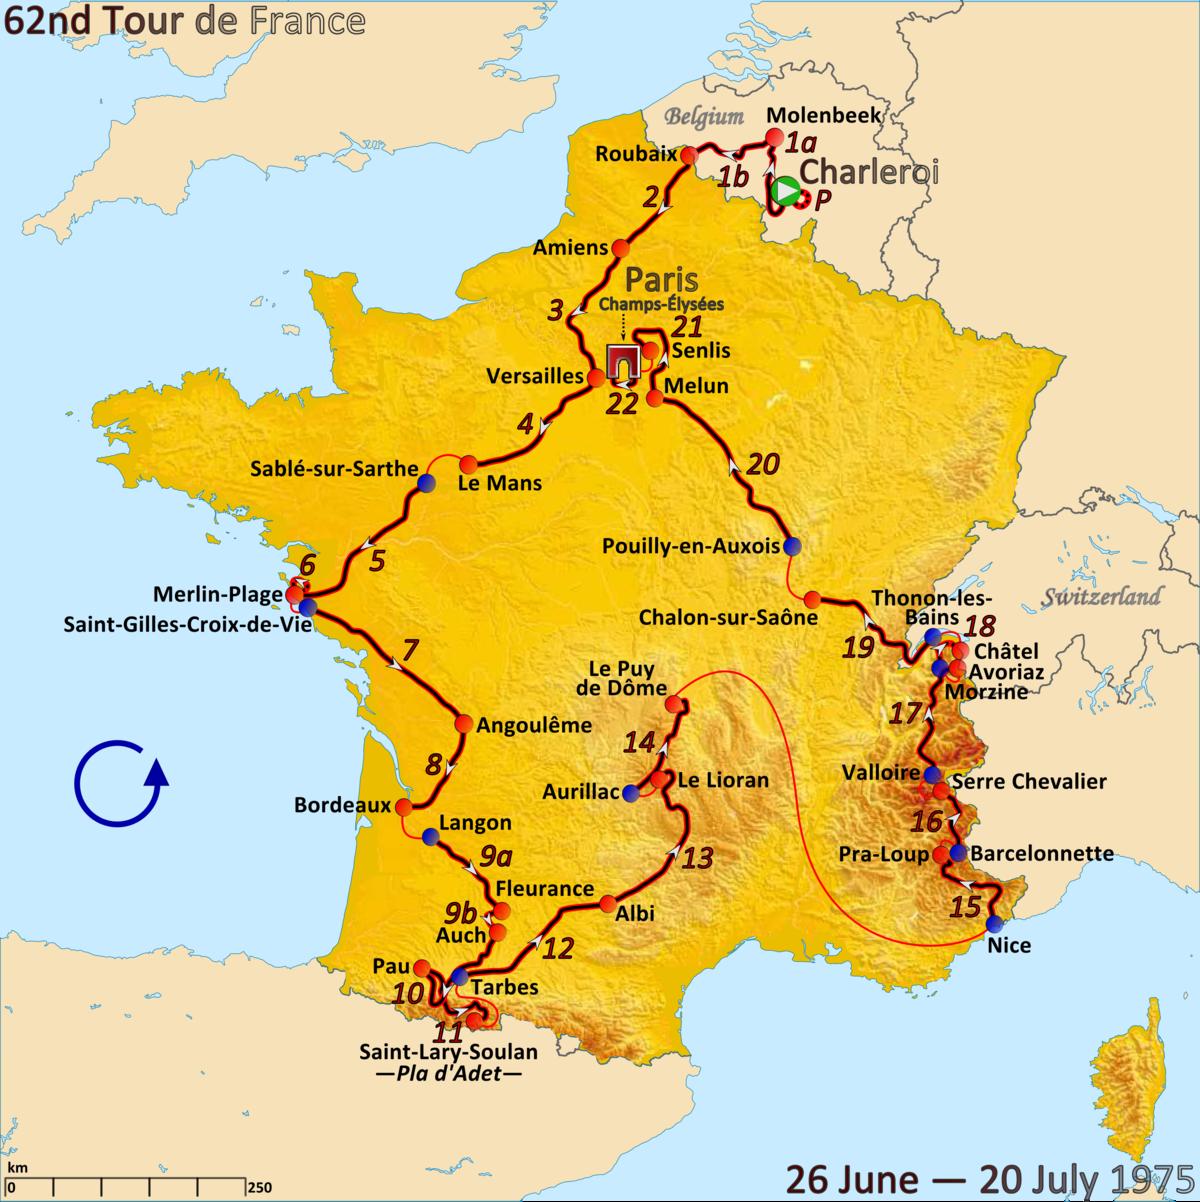 1975 Tour de France Wikipedia